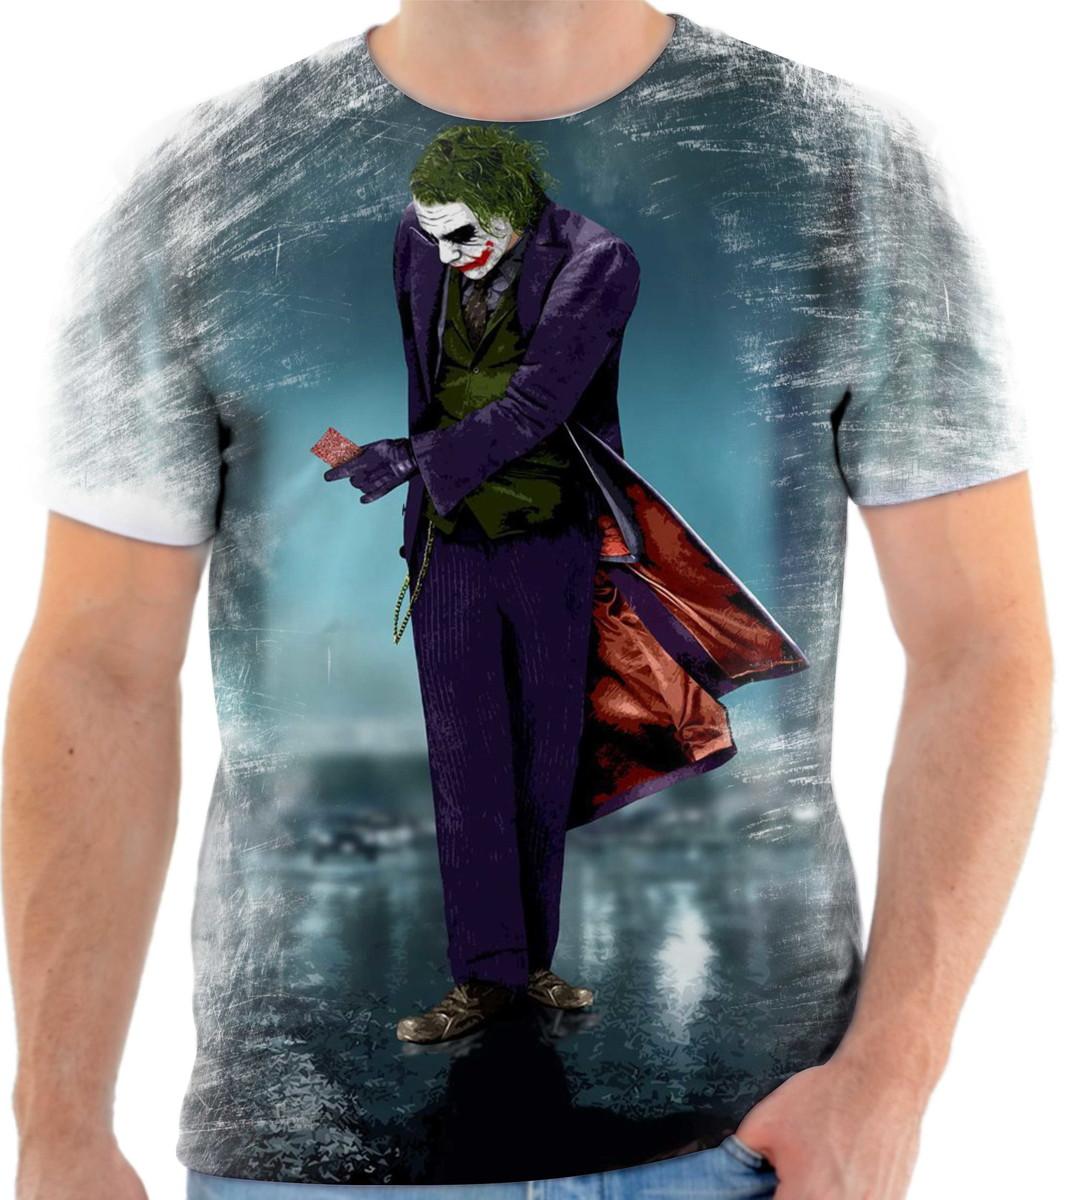 b18b8eee104c4 Camiseta Batman Coringa Herói 44 Ótima Qualidade no Elo7